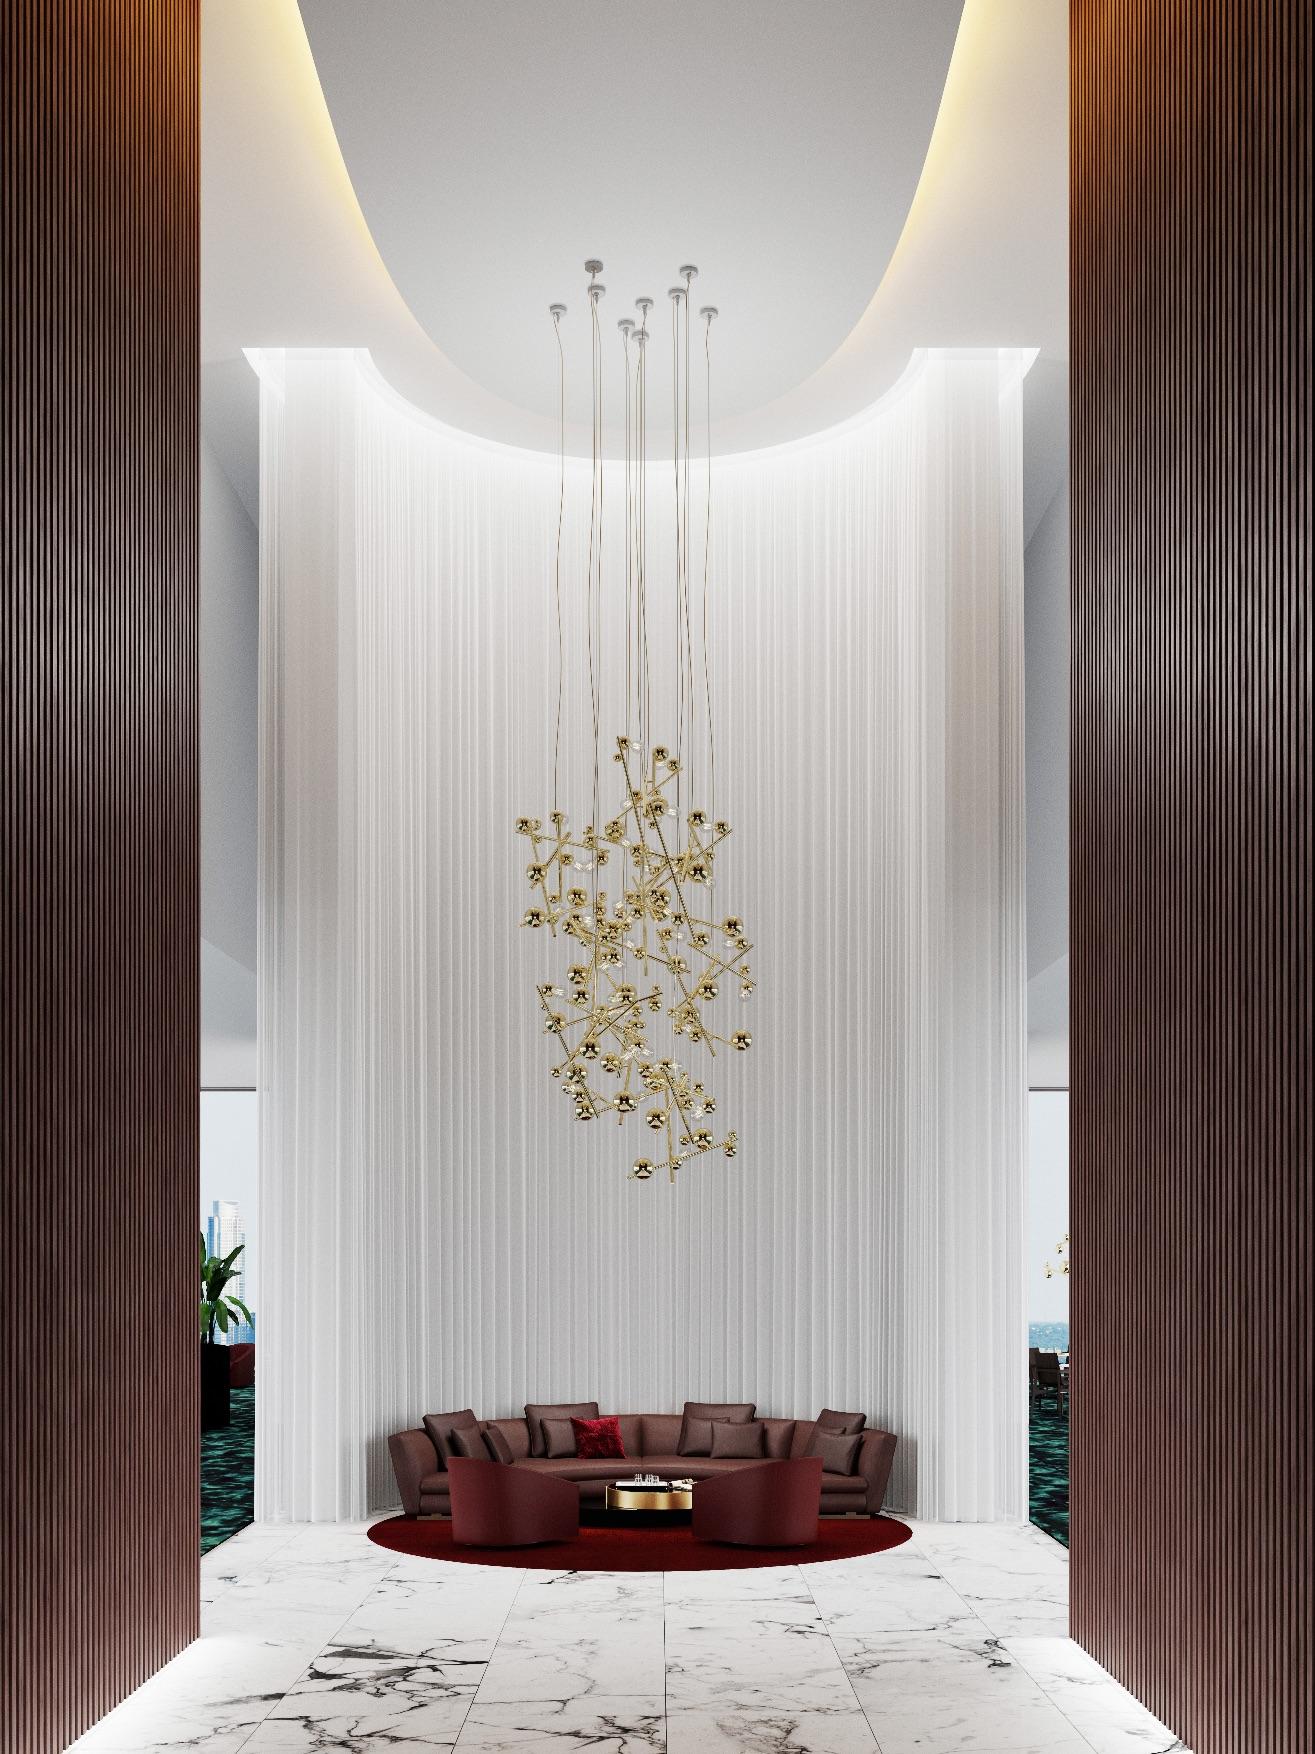 Brandvanegmond_Galaxy-collection_chandelier-round_lighting-composition_9xGALC100BR_brass-finish_interior